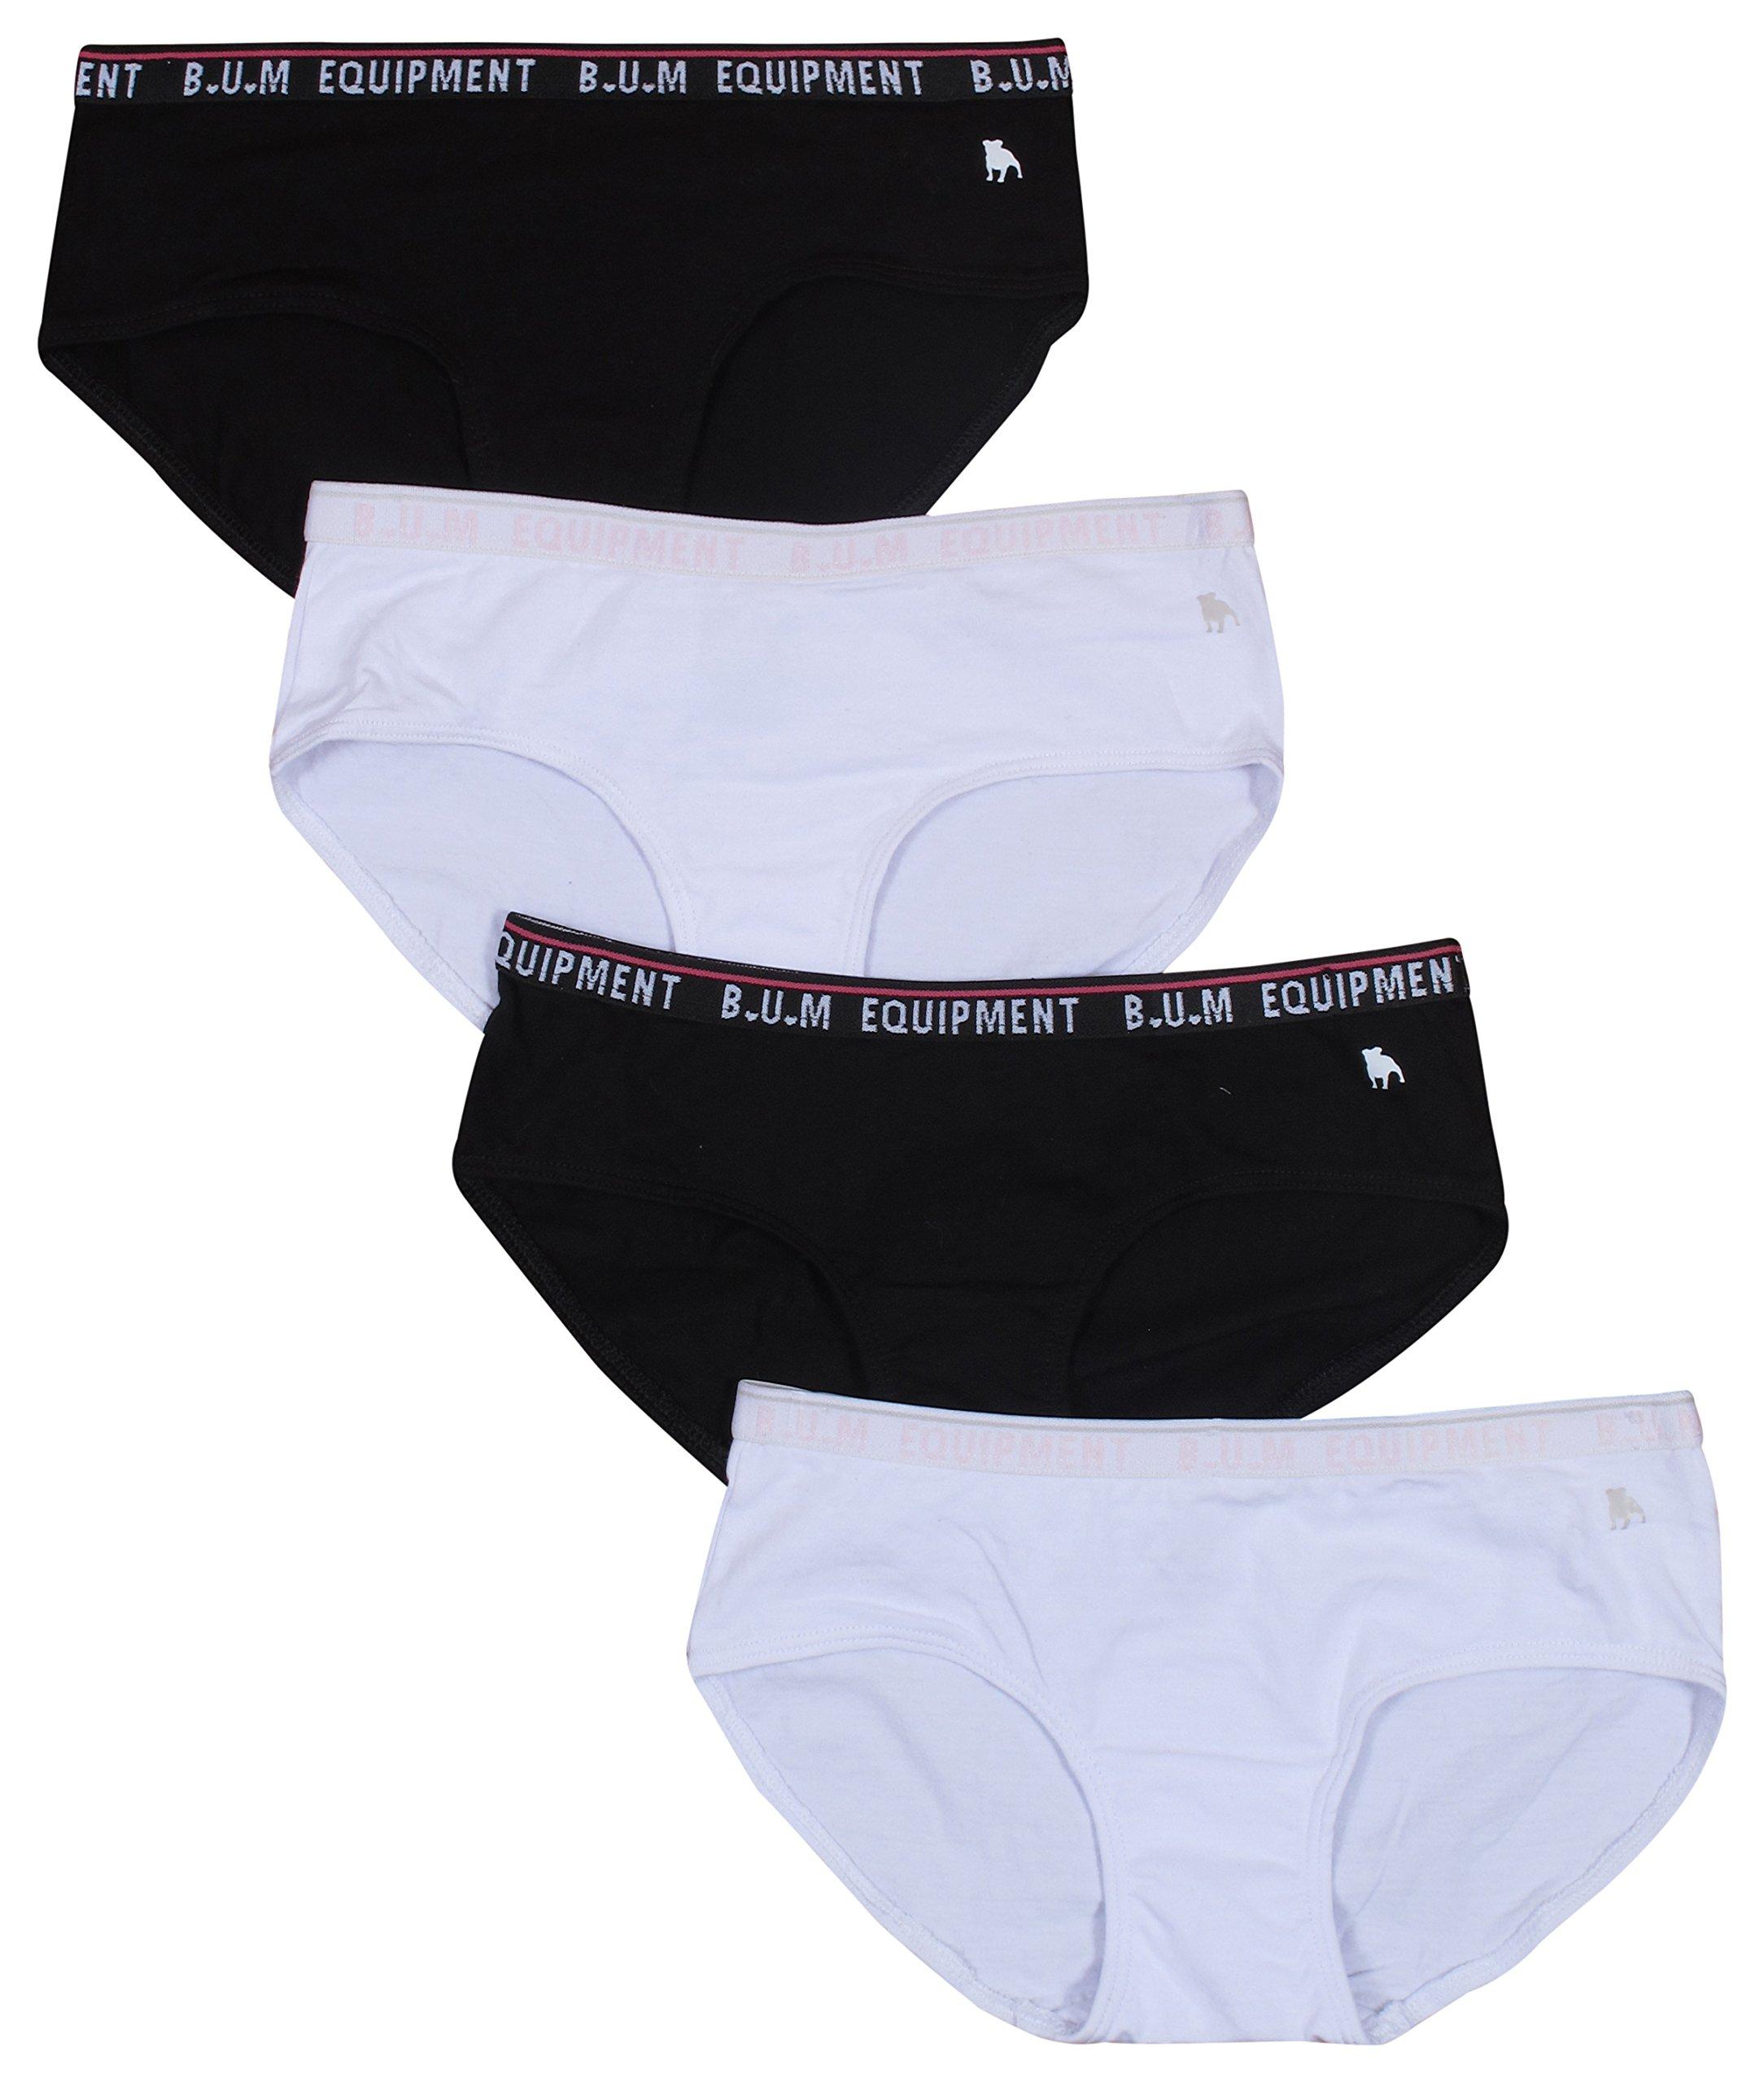 B.U.M. Equipment Girls 4 Pack Hipster Underwear, Black/ White, Medium - 7/8'